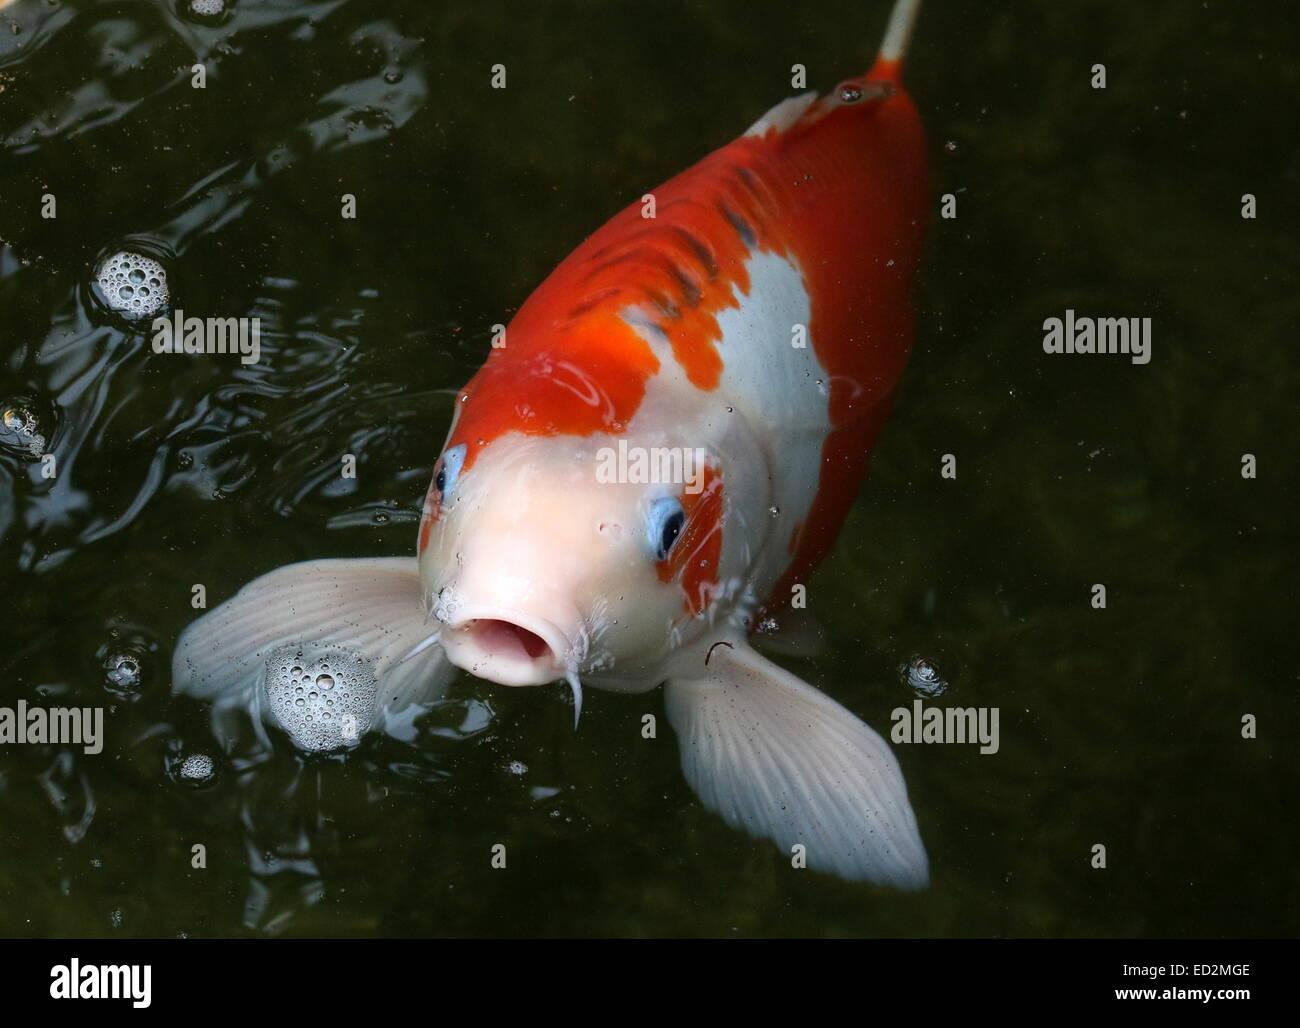 Orange And White Japanese Koi Carp With Blue Eye Lids Coming Up To Stock Photo Alamy